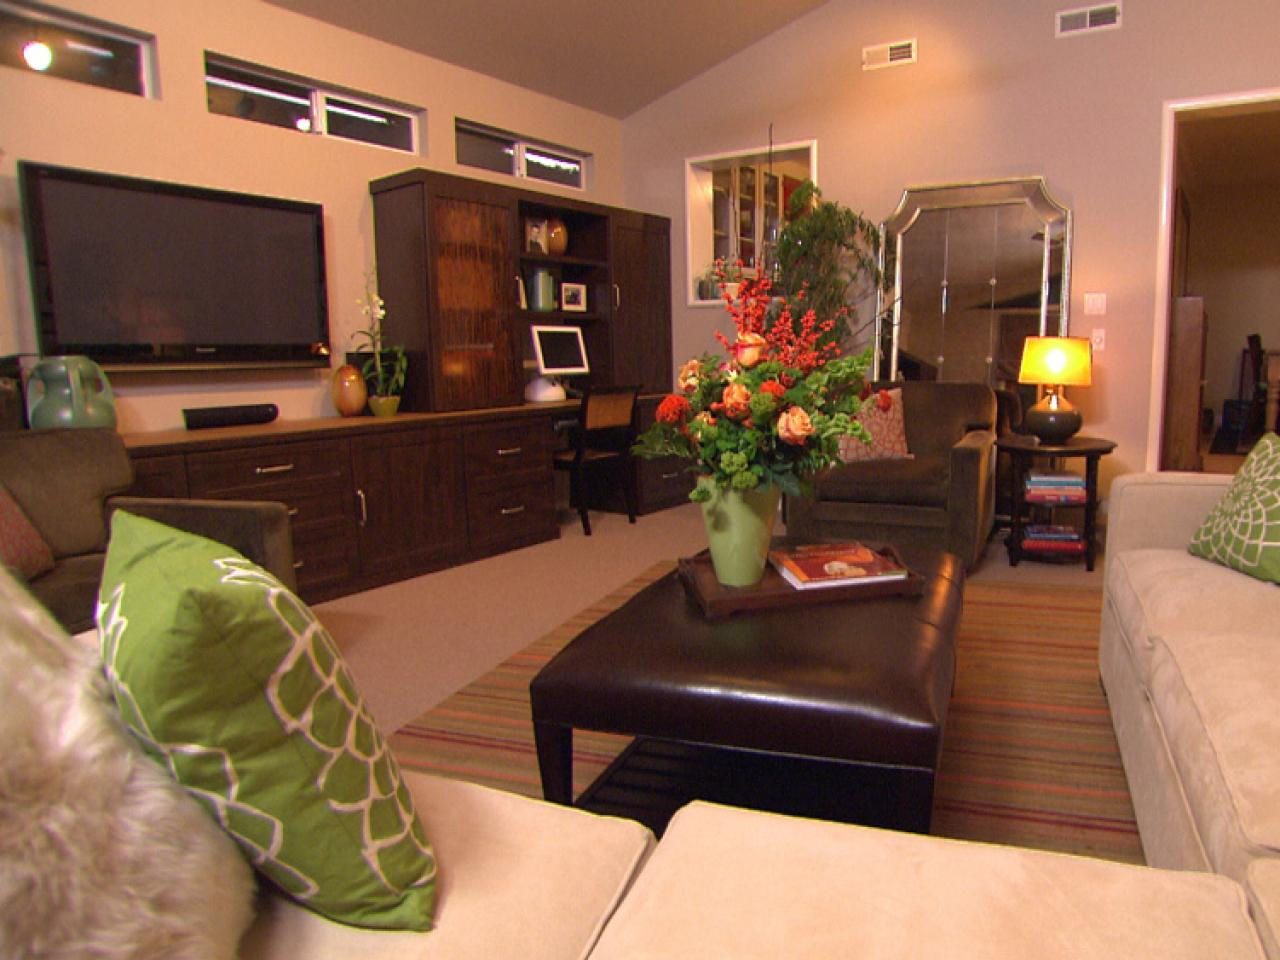 Small Living Room Organization Ideas - Modern House on Small Apartment Organization  id=72007